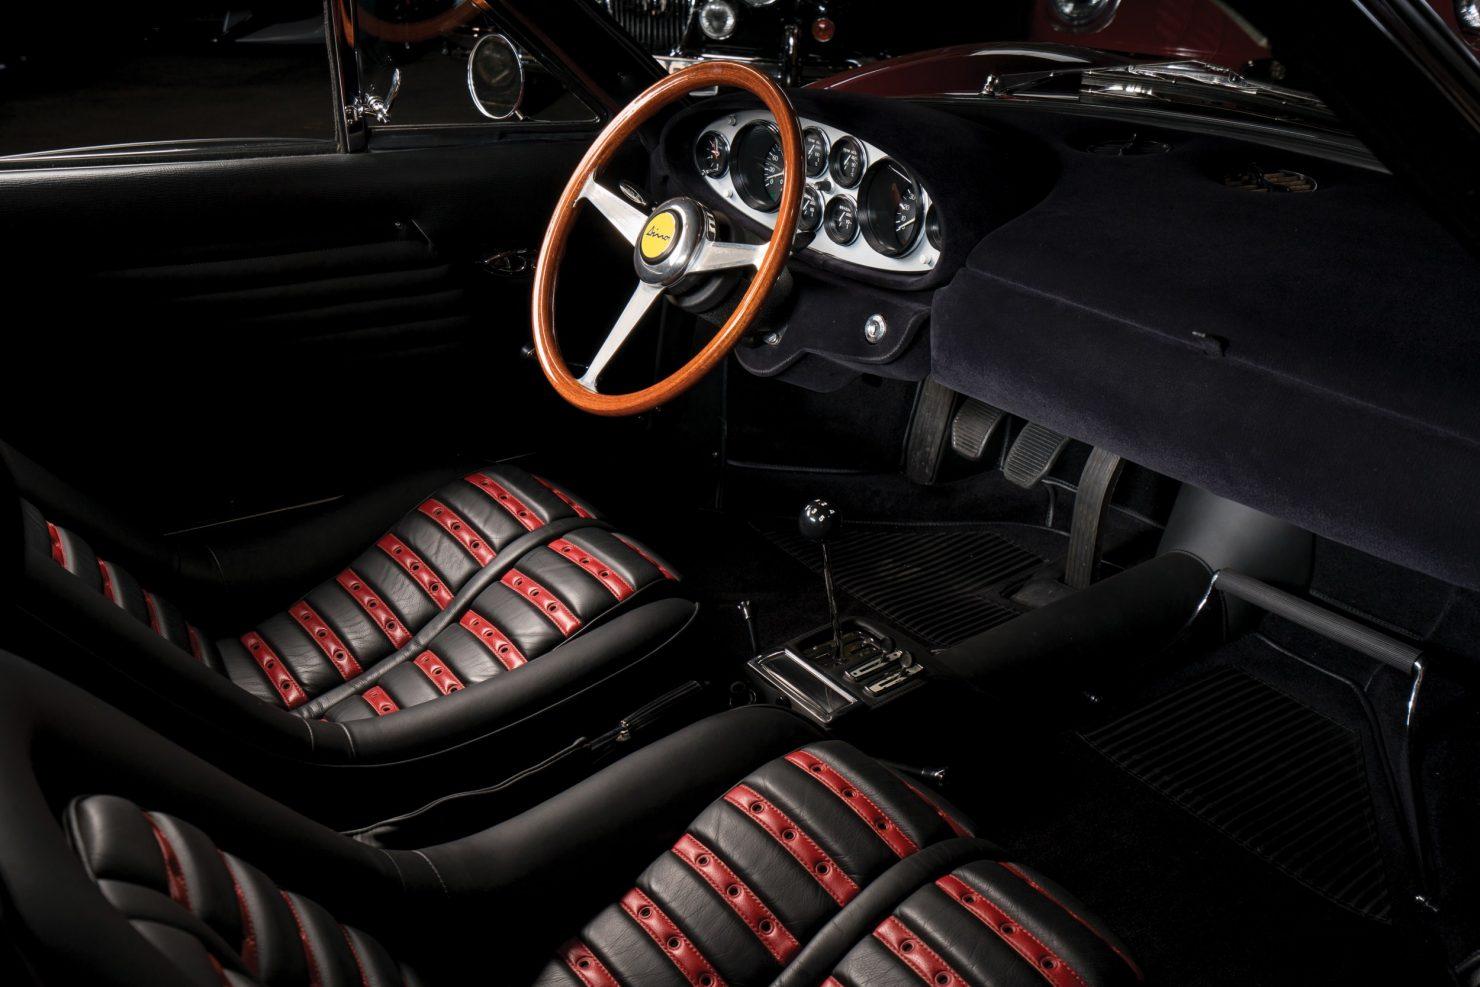 ferrari dino 246 11 1480x987 - 1969 Ferrari Dino 246 GT